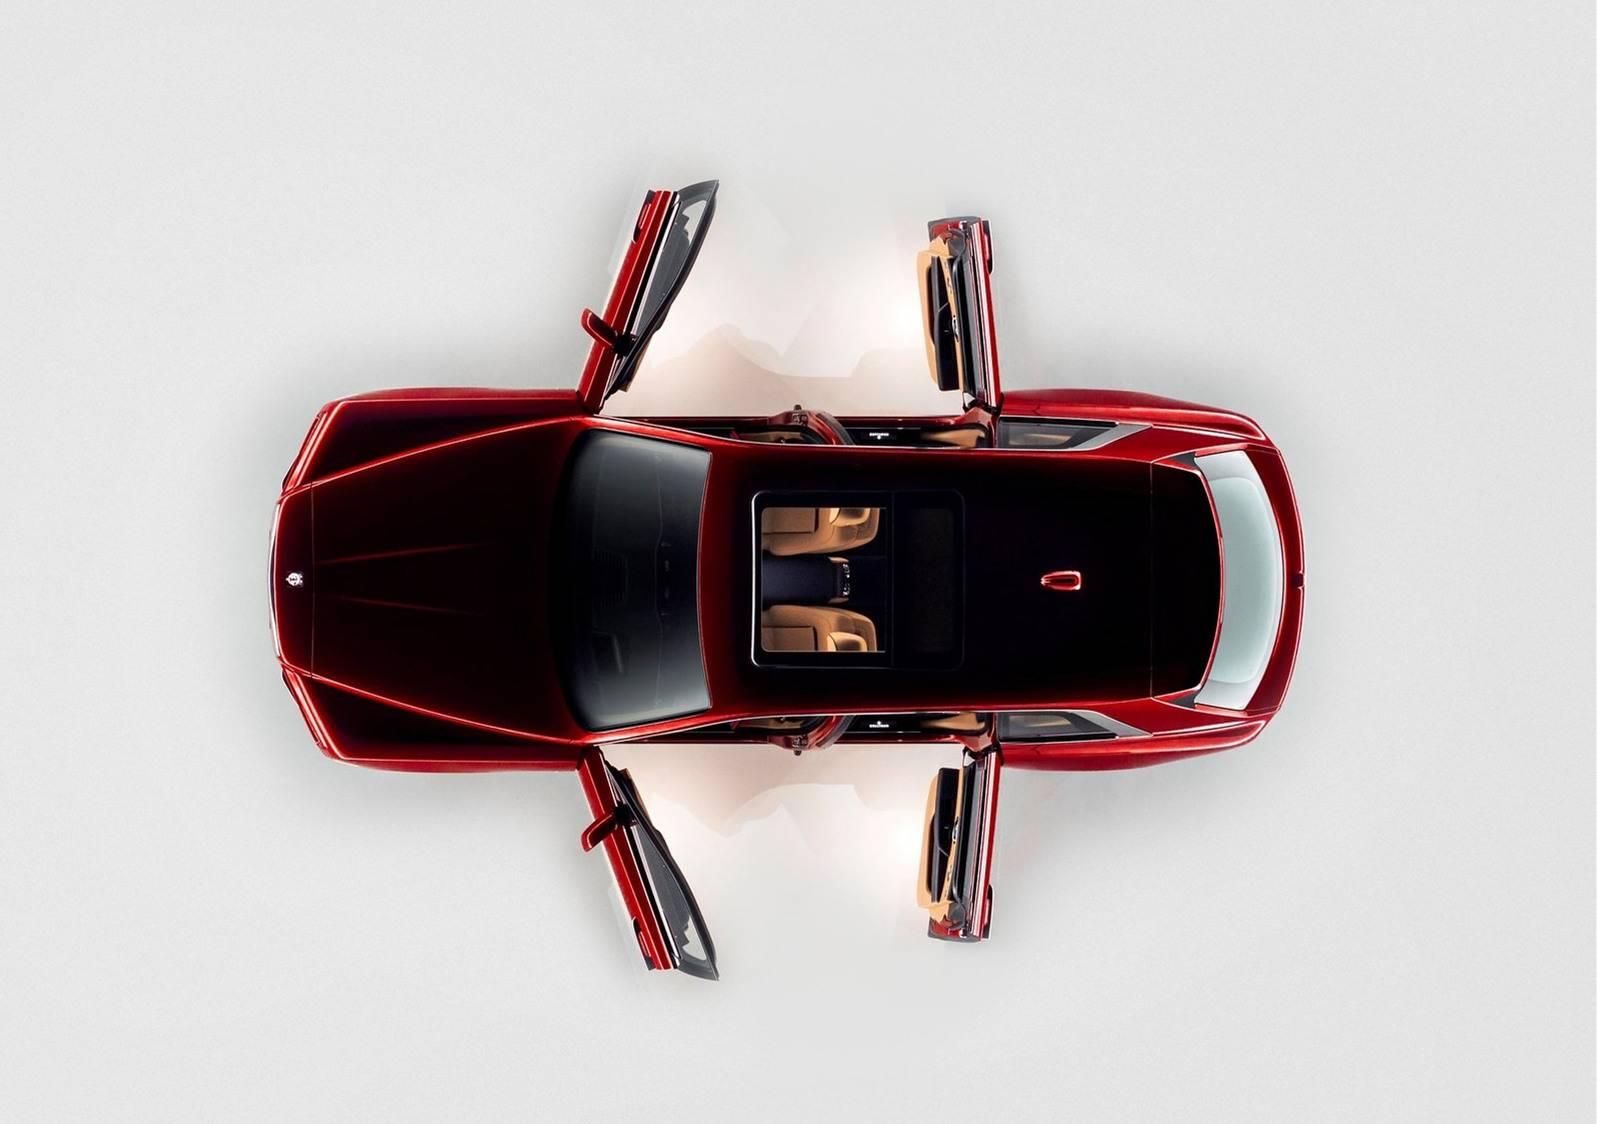 Rolls-Royce-Cullinan-2019-1600-11.jpg